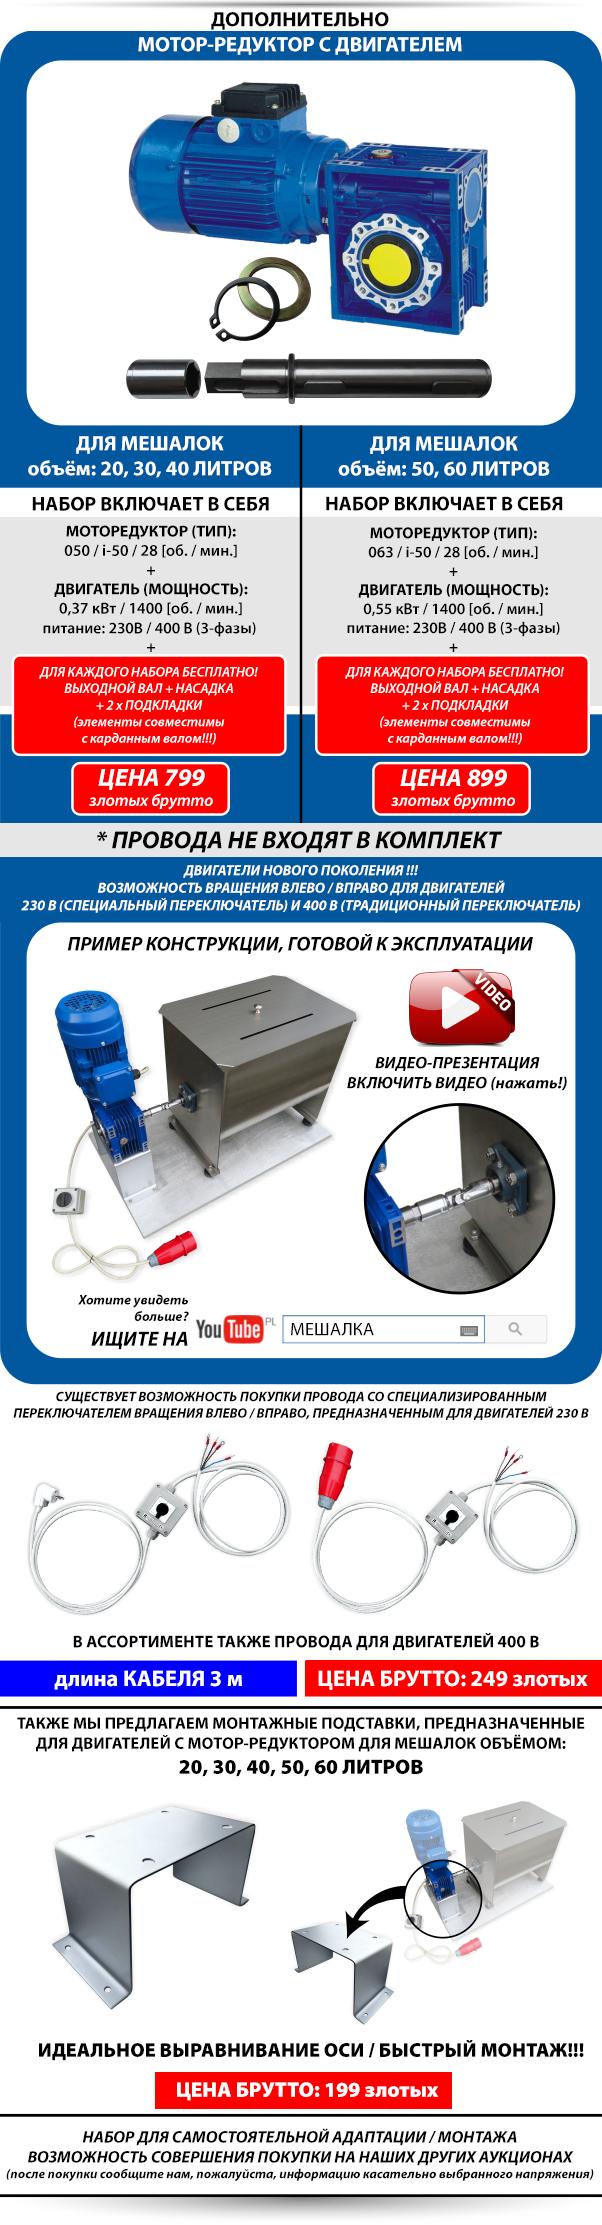 http://technologies4all.pl/zdjecia%20prestashop/ROSJA/26.05/nowy%20ornament.png